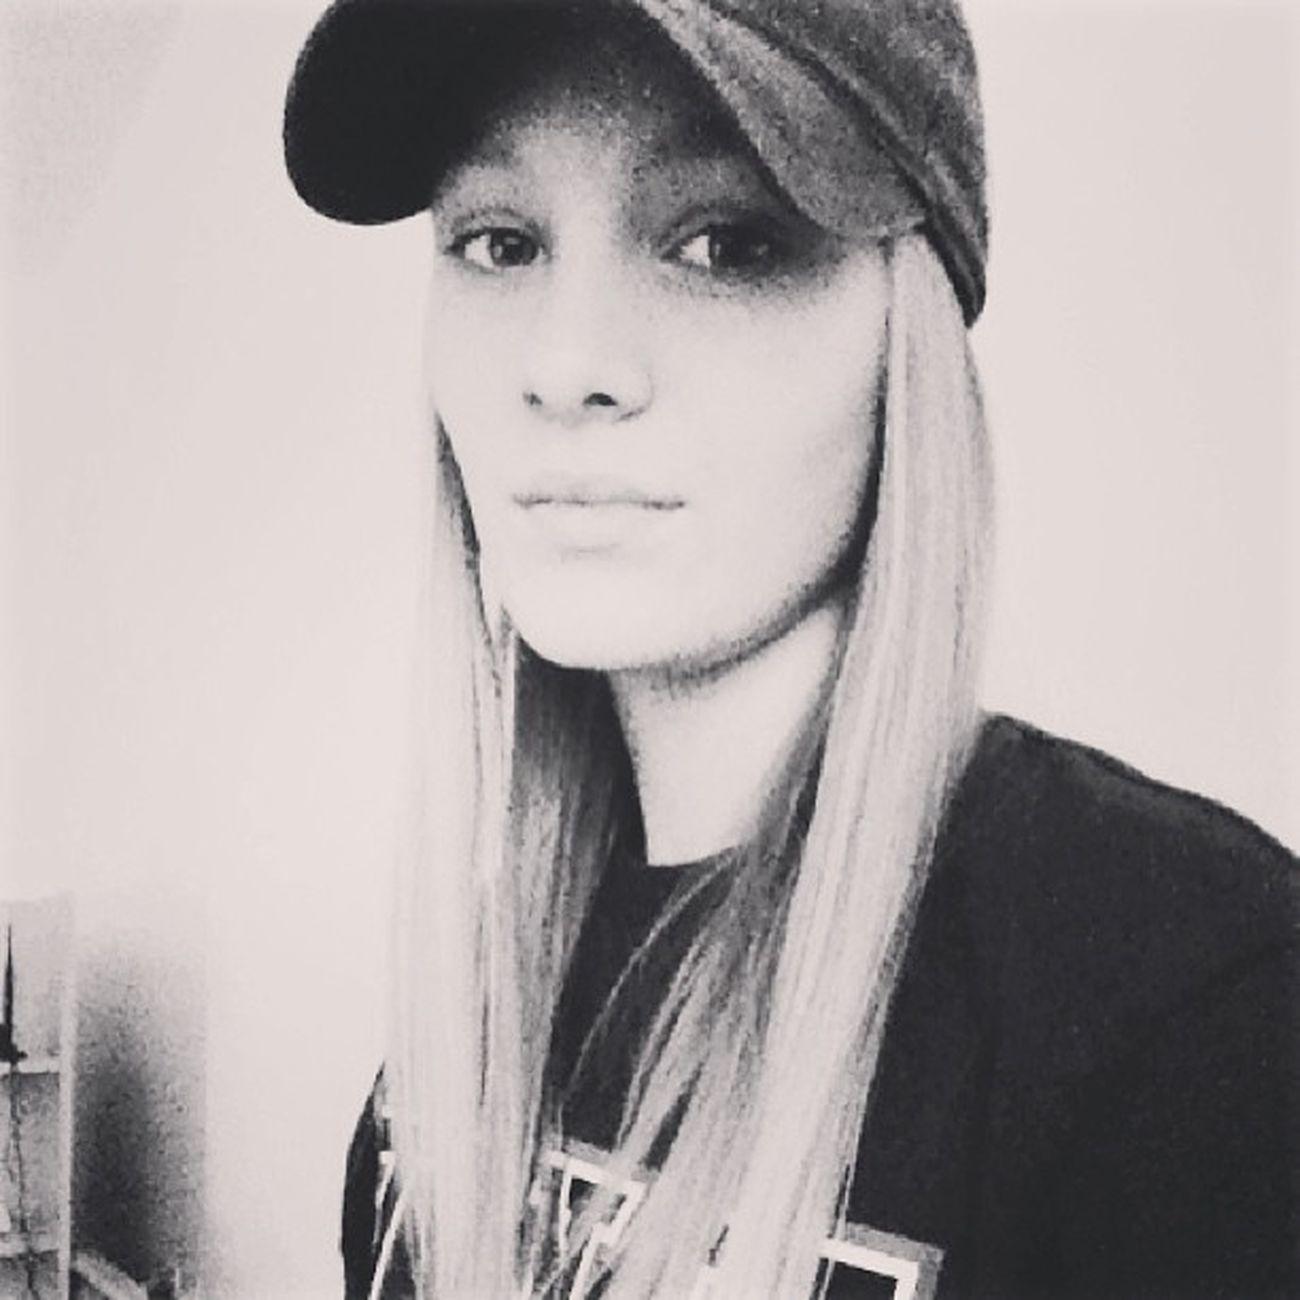 Laura Me I Blonde Hair Blondehair Summer Crazy Yolo Nike Hat Followme Instacro Black White Pred svima foliram se malo da mi nije stalo, al' me srce izdalo ;)